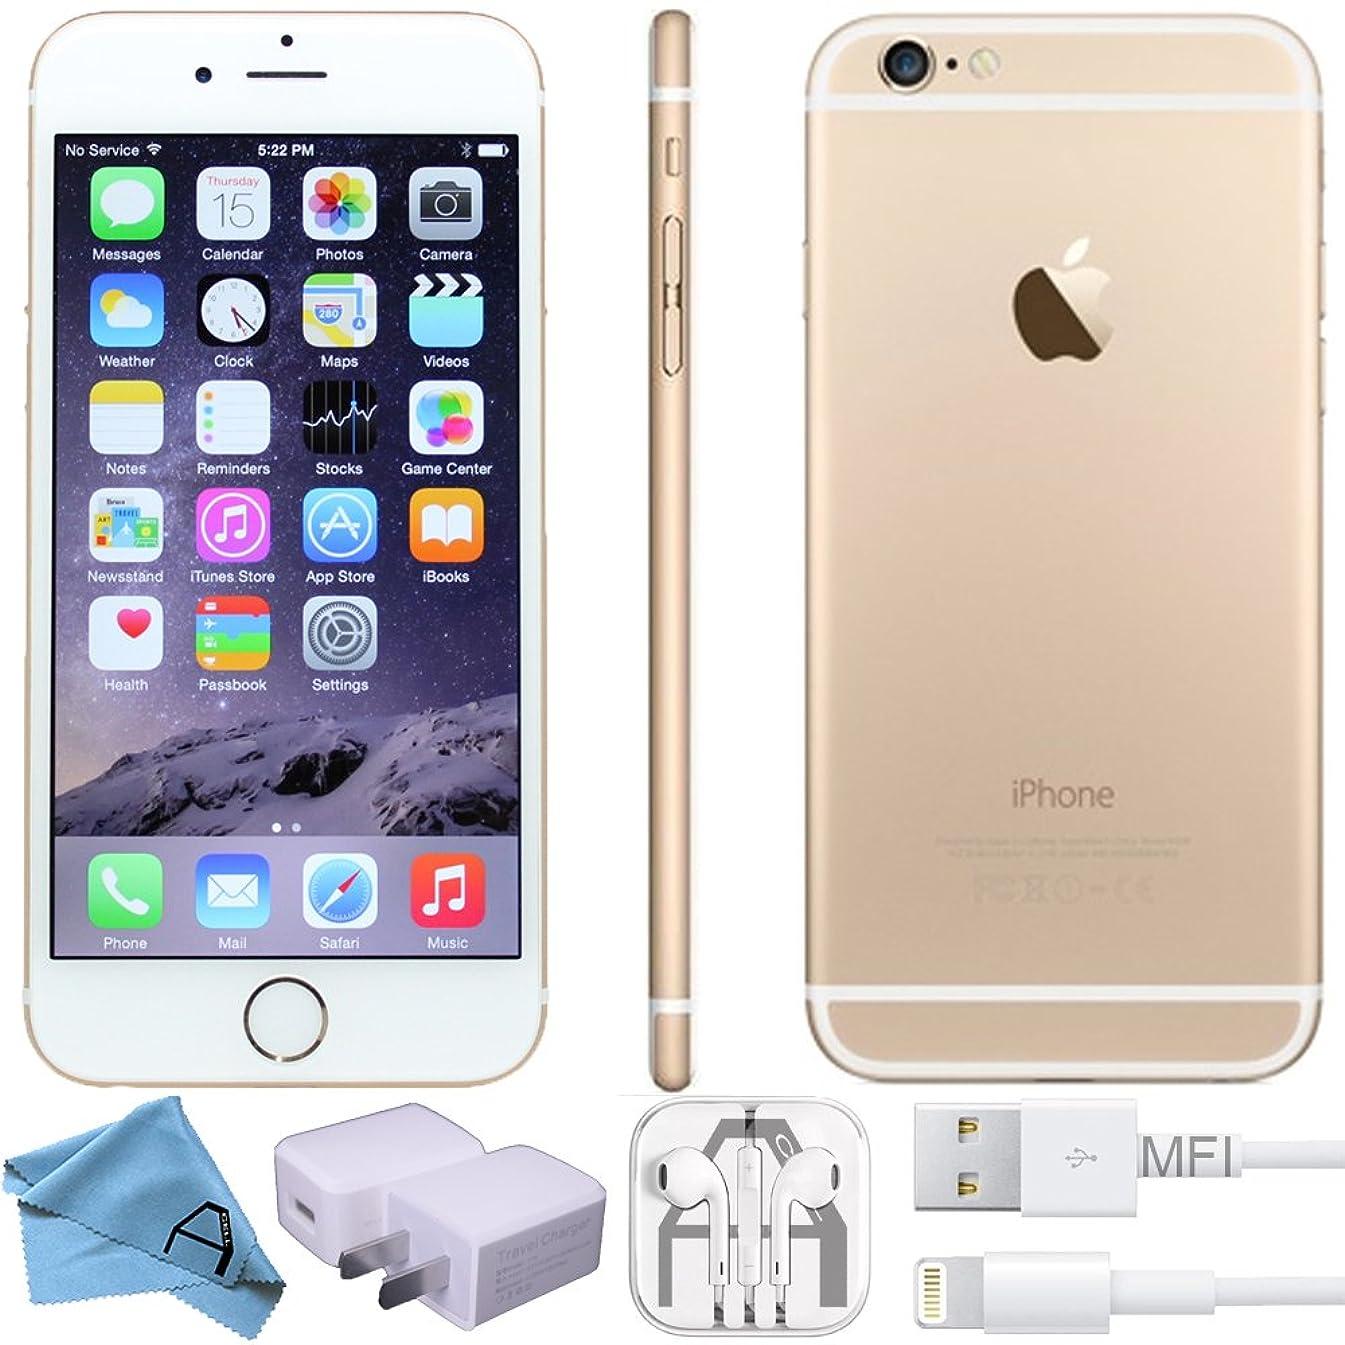 Apple iPhone 6, GSM Unlocked, 32GB - Gold (Renewed)